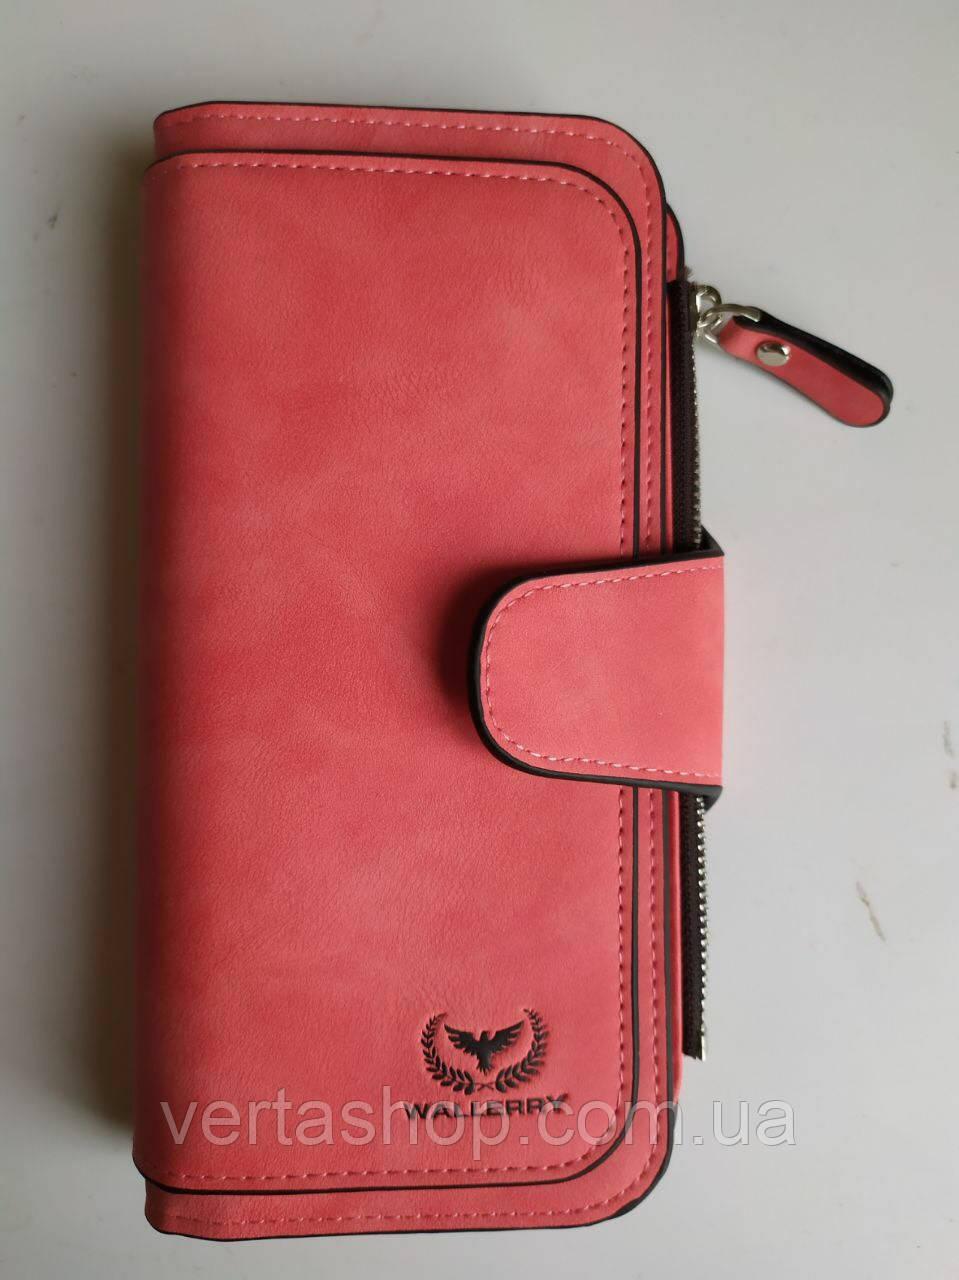 Кошелек 2345 Красный Wallerry